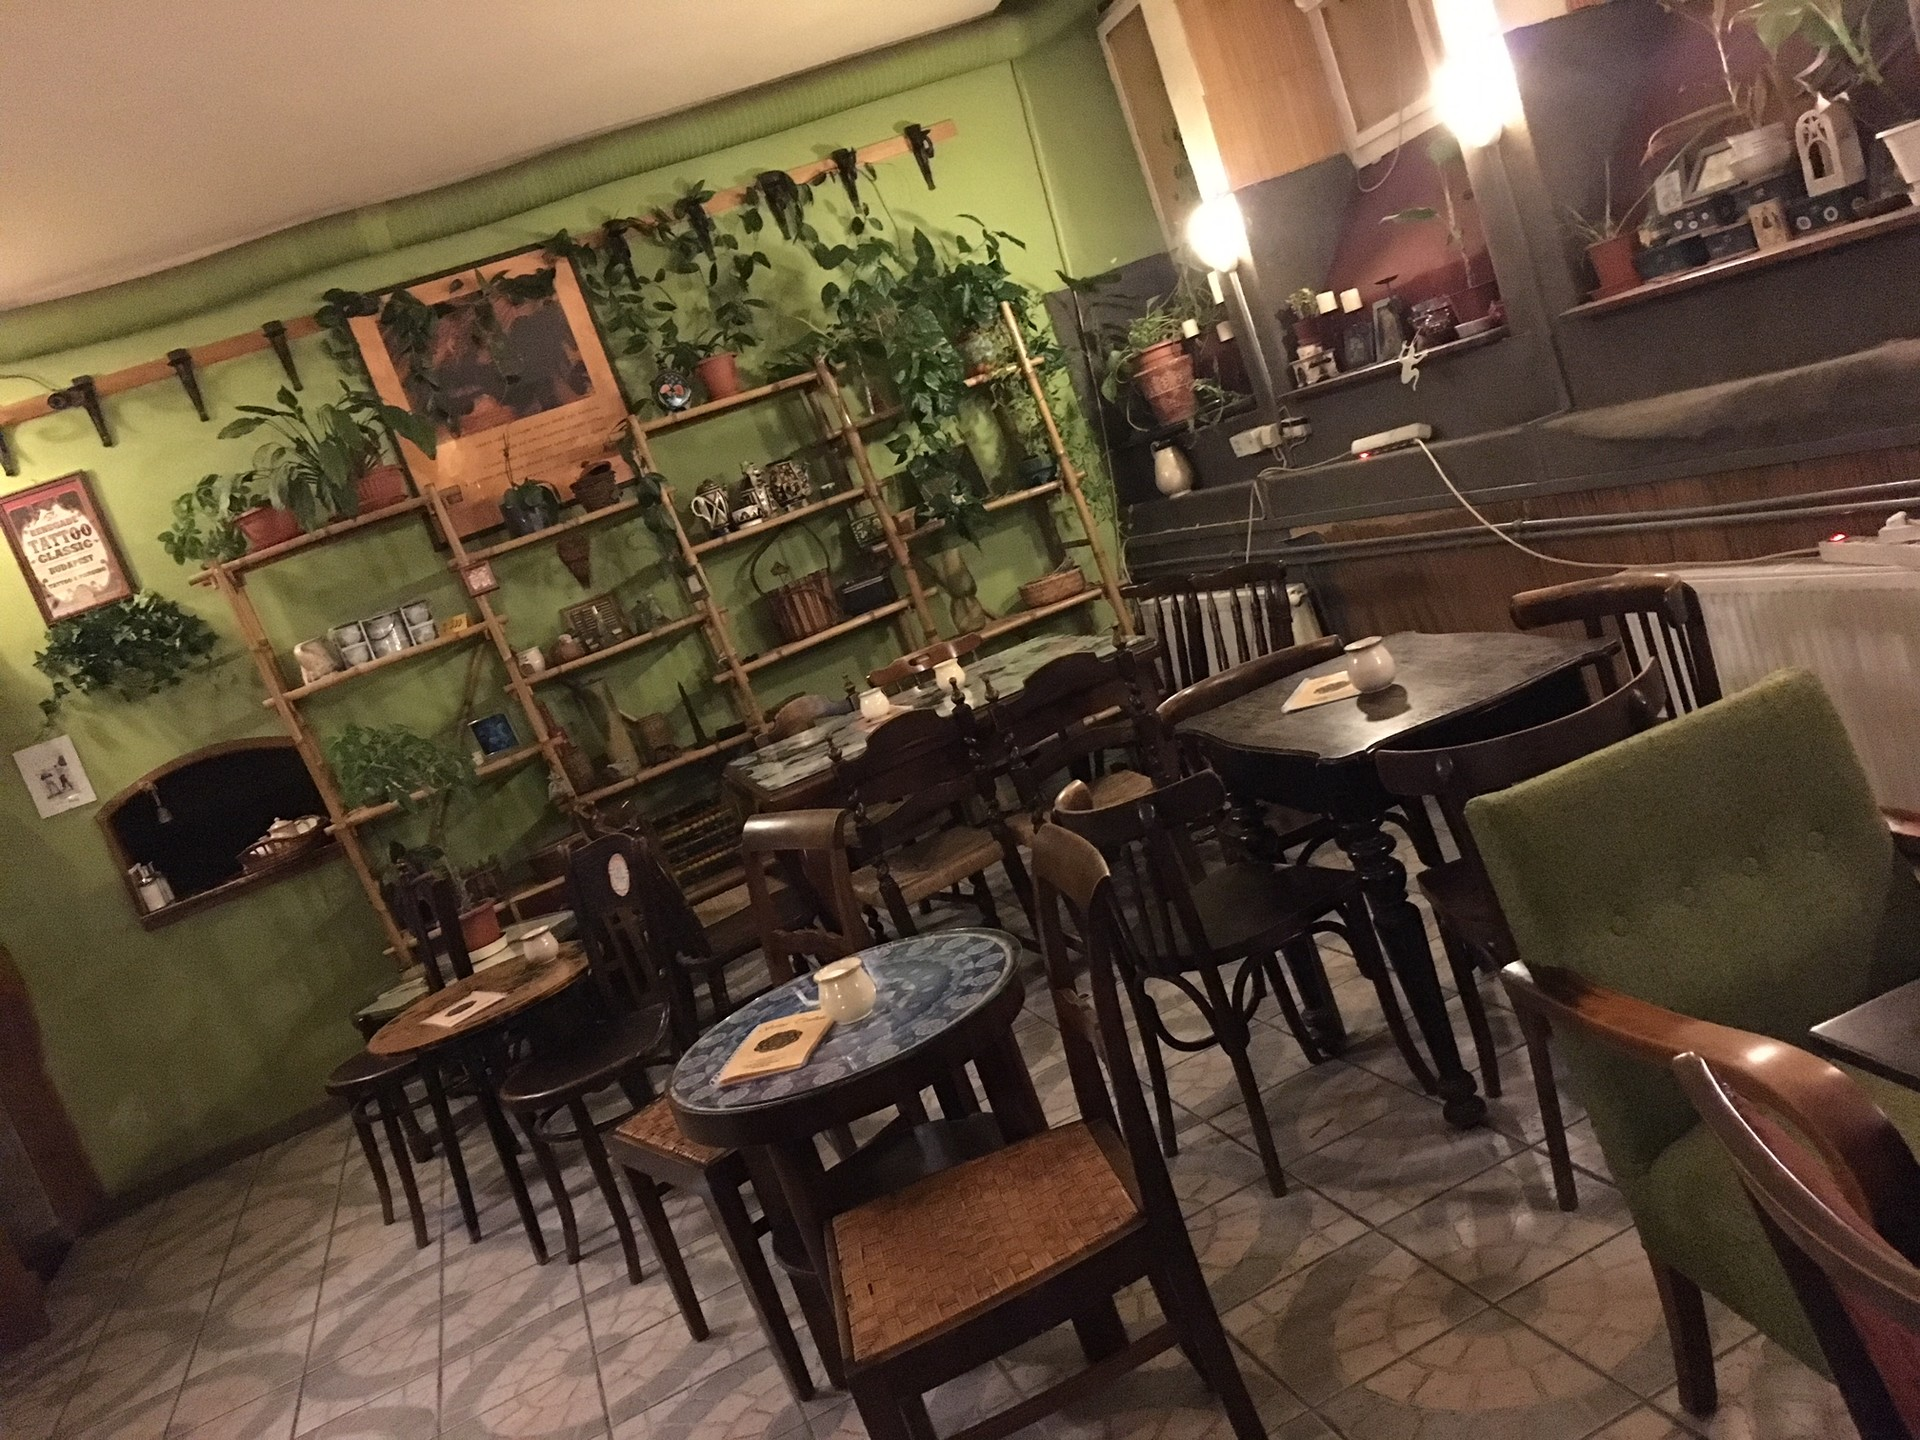 Cafe hopping :Sirius Tea house | Erasmus blog Budapest, Hungary on glass house cafe, muffin house cafe, coffee house cafe,